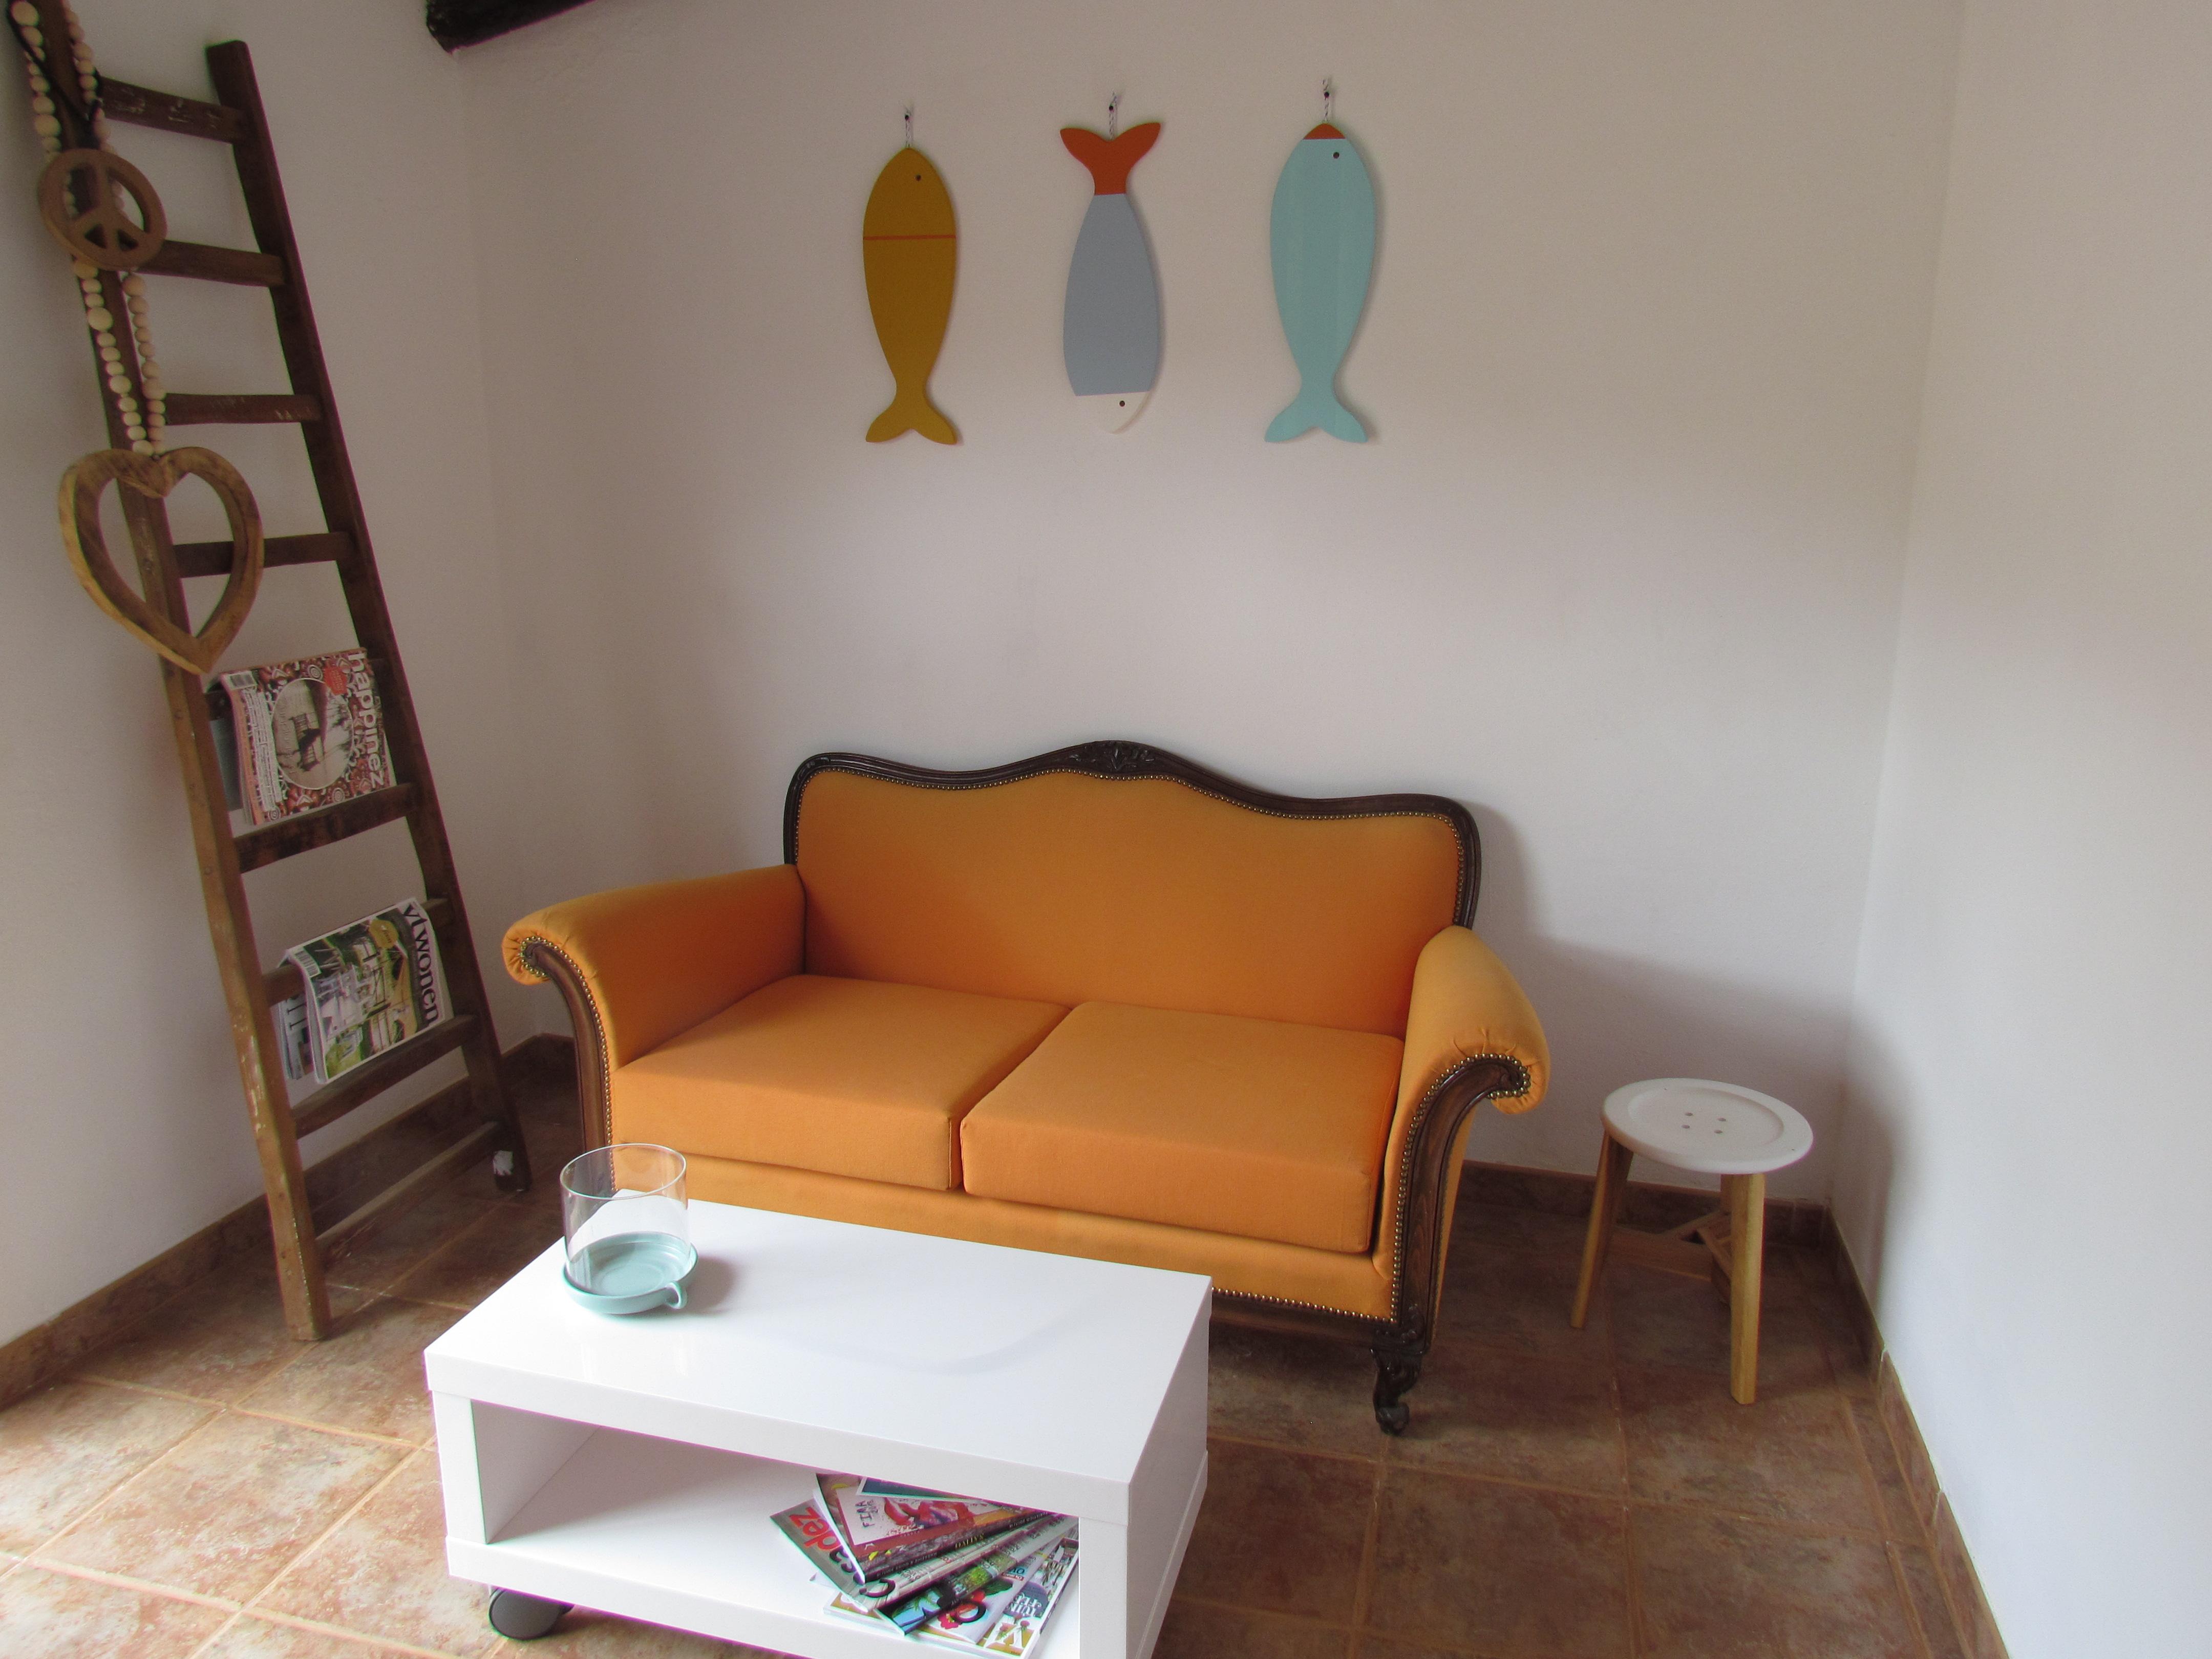 Kleedkamer In Slaapkamer : Appartement nova alofa